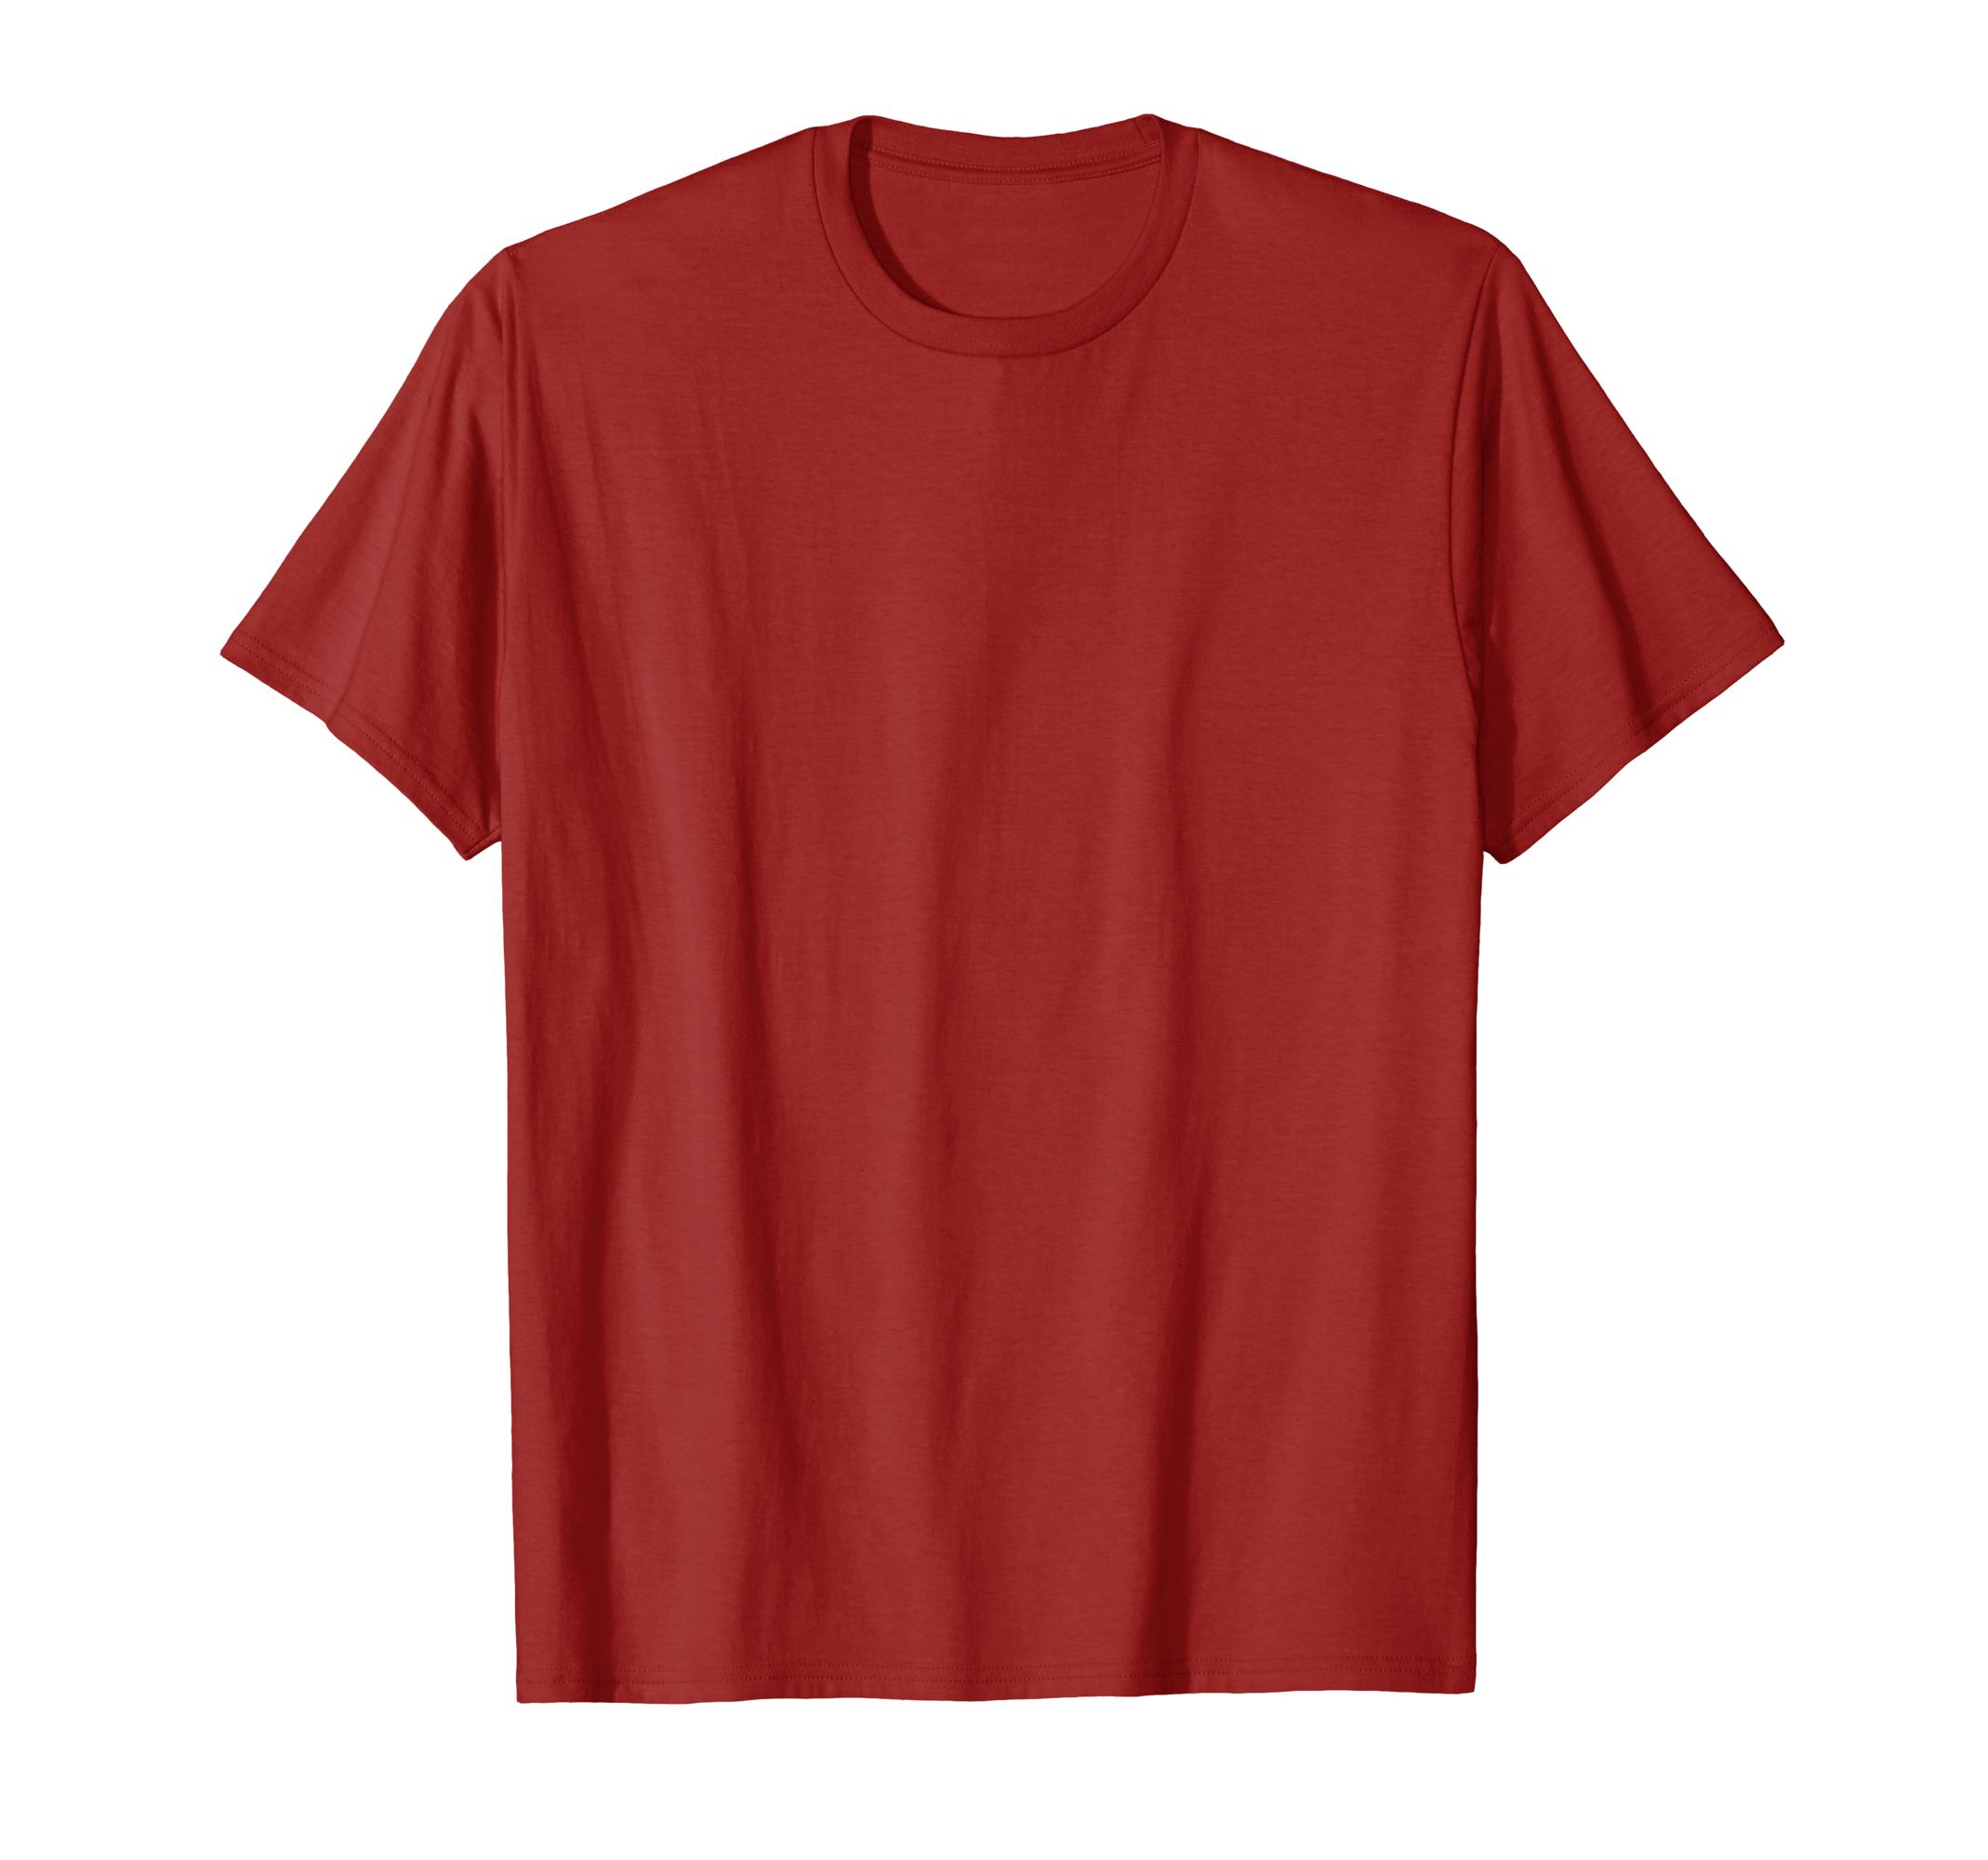 Amazon.com 19 Years Old T-Shirt Fun 19th Birthday Gift Ideas Christmas Clothing  sc 1 st  Amazon.com & Amazon.com: 19 Years Old T-Shirt Fun 19th Birthday Gift Ideas ...